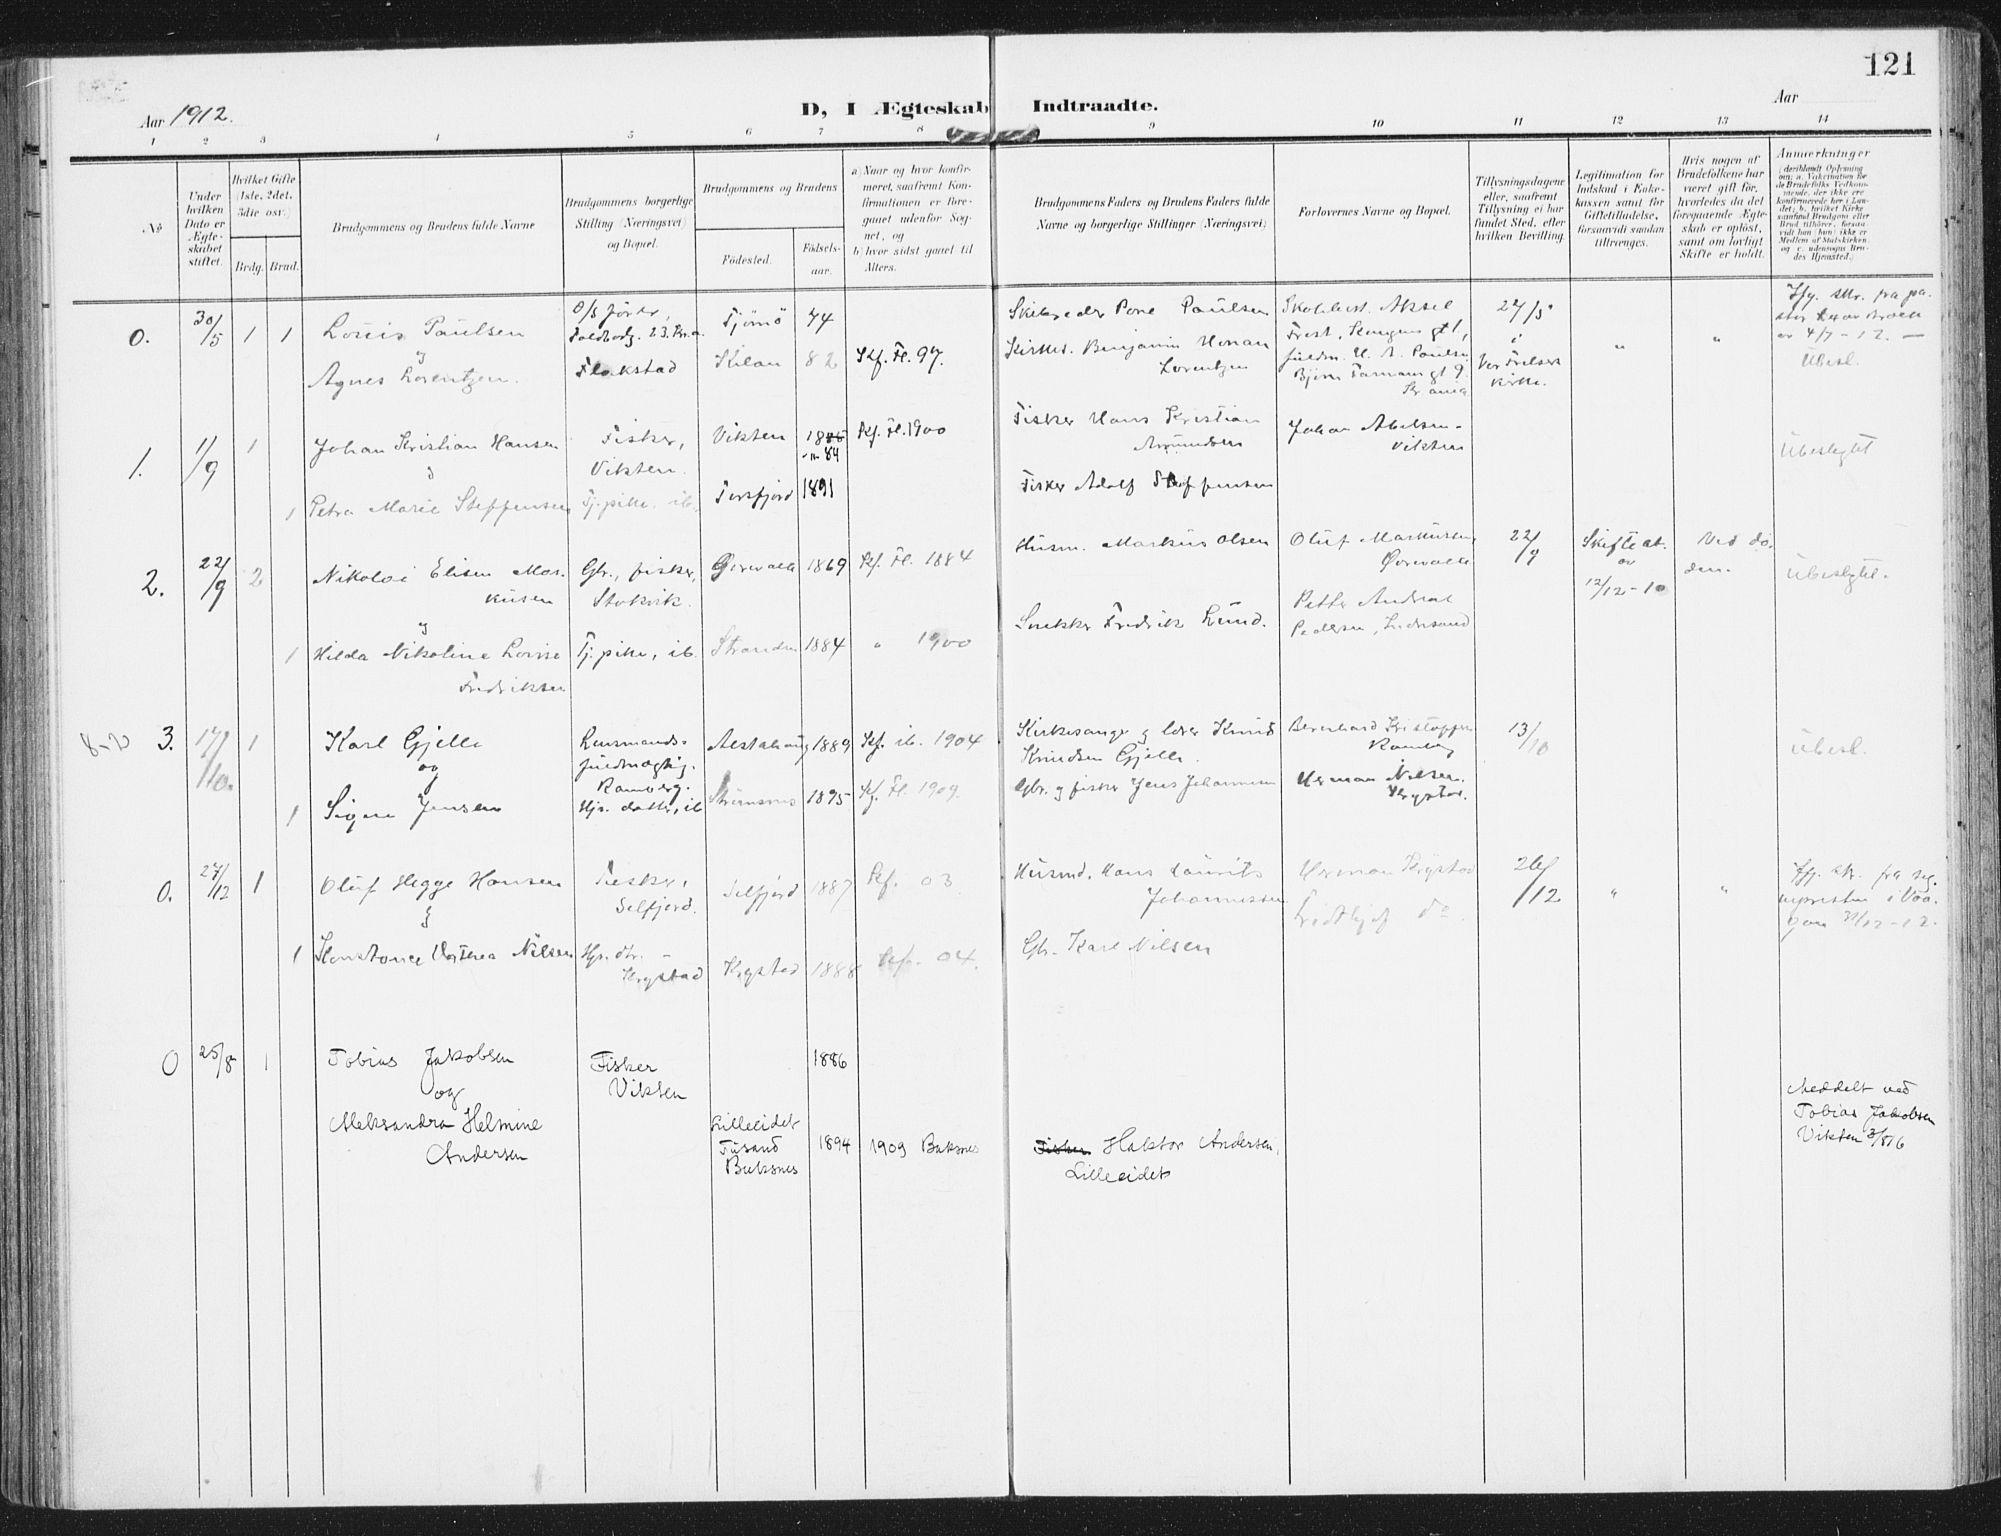 SAT, Ministerialprotokoller, klokkerbøker og fødselsregistre - Nordland, 885/L1206: Ministerialbok nr. 885A07, 1905-1915, s. 121